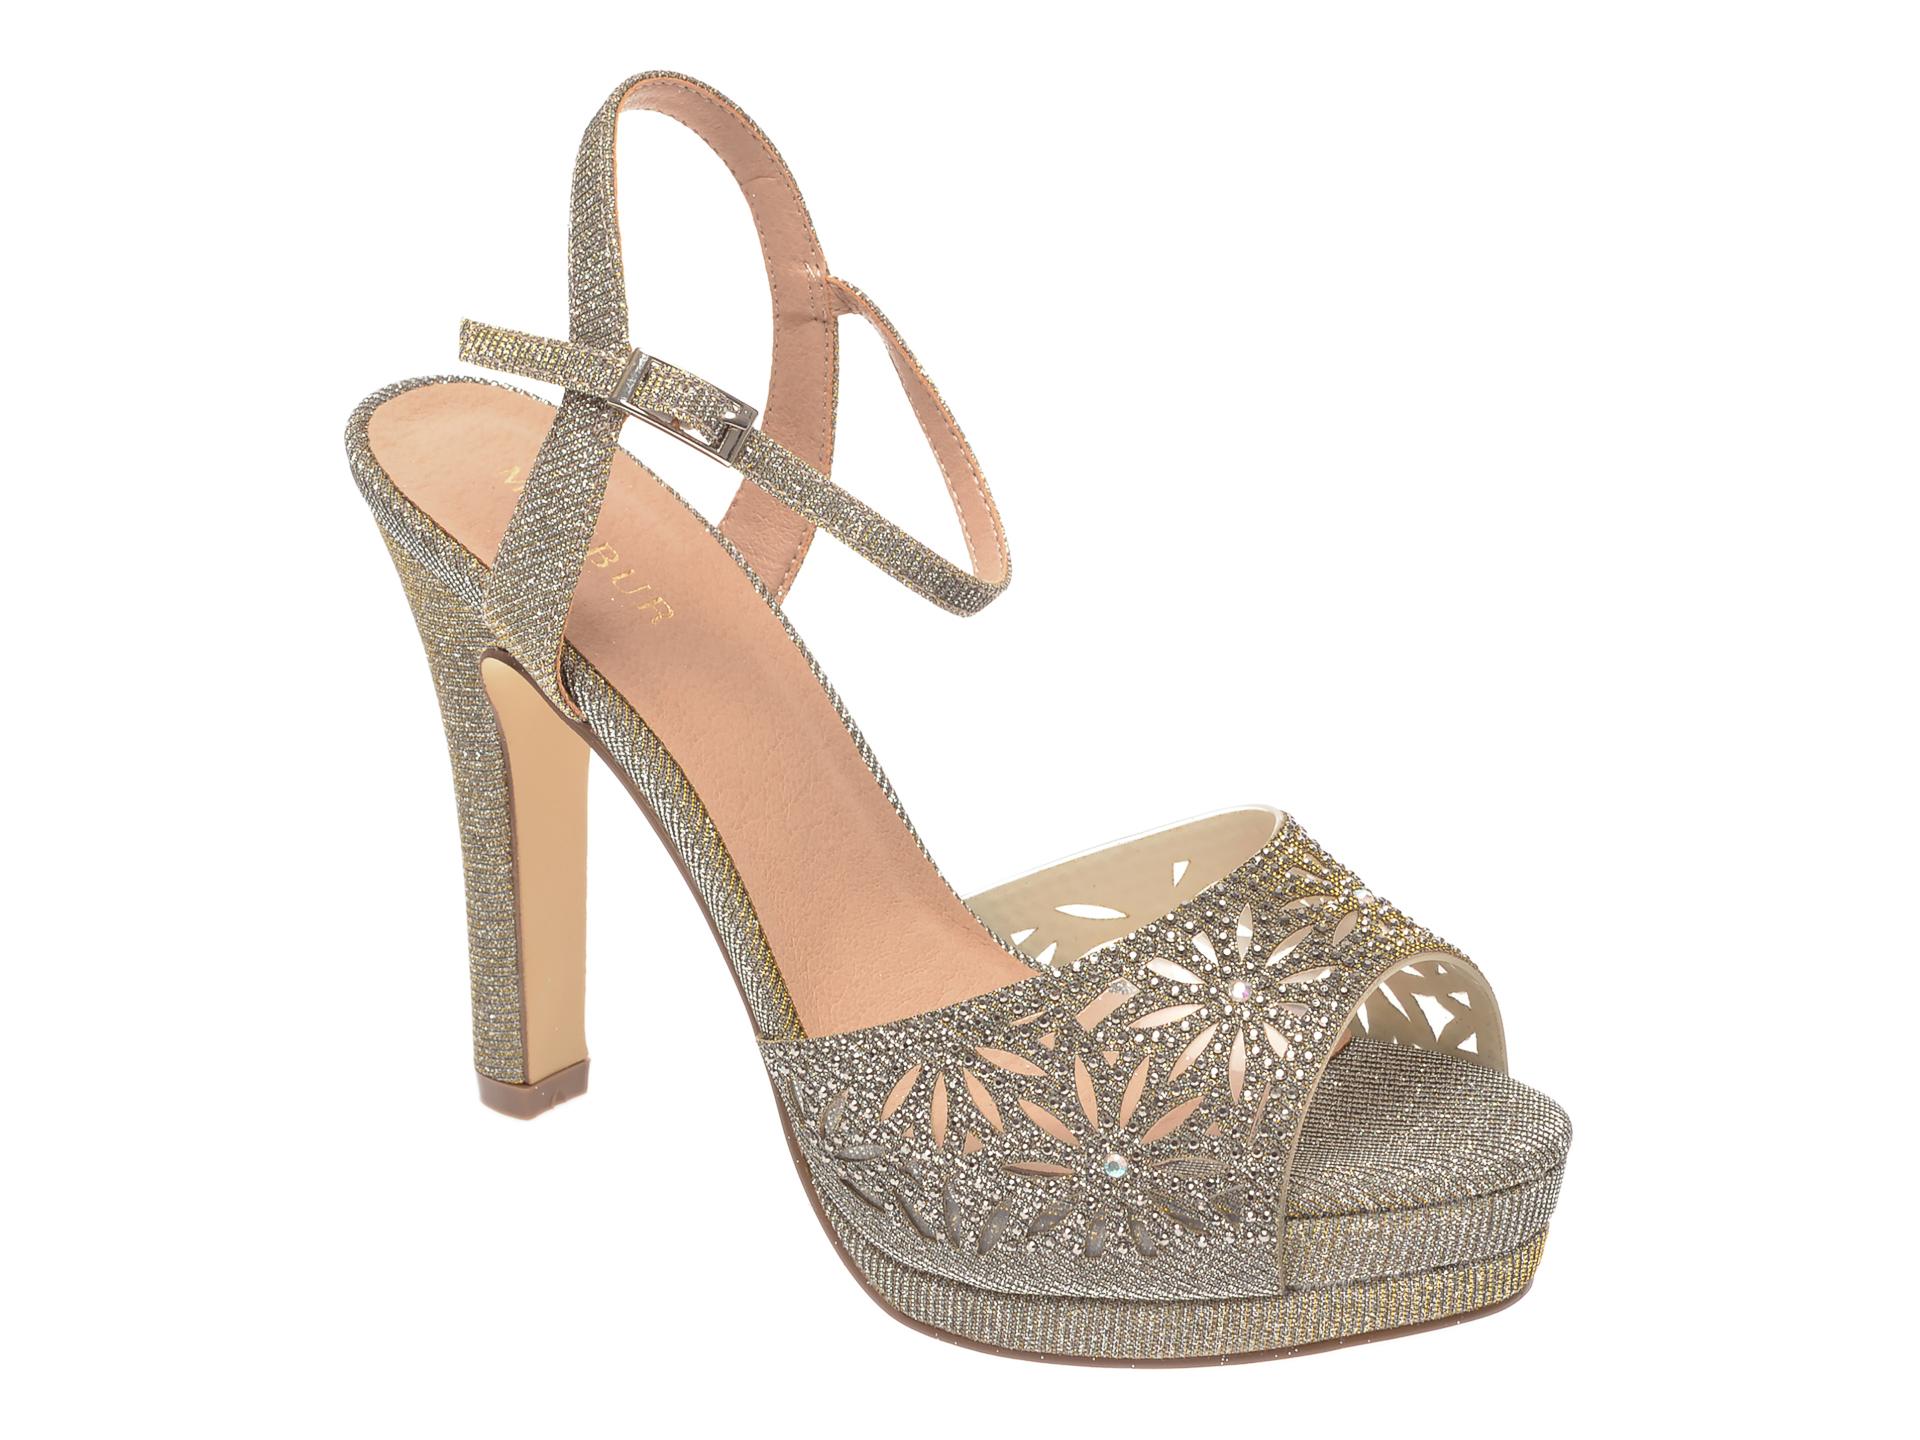 Sandale MENBUR aurii 21797, din piele ecologica New